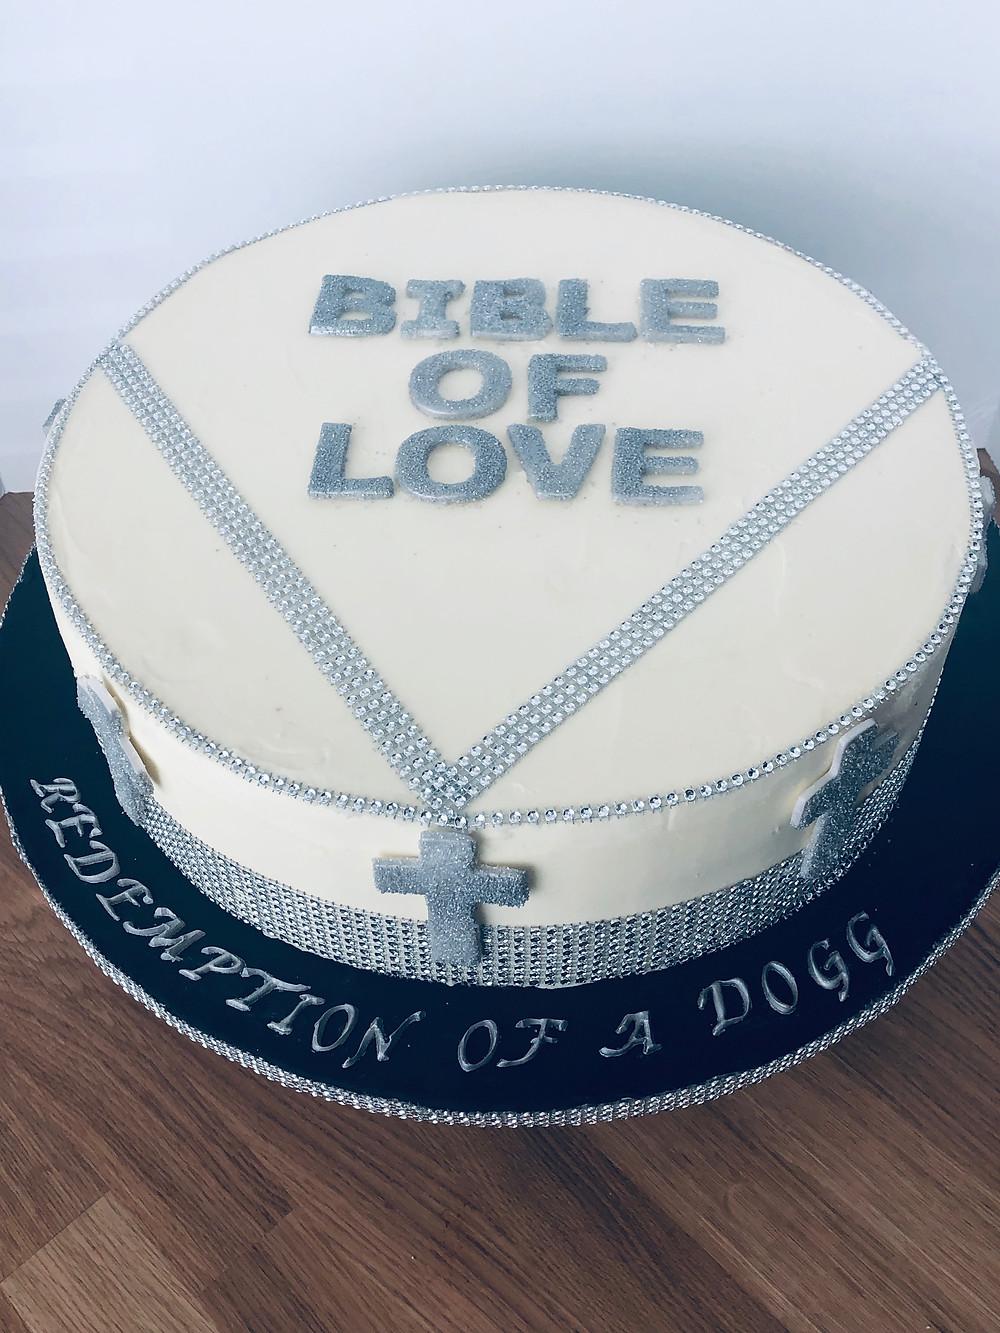 Snoop Dogg, Bible of Love, Cake, Sugar Bread!